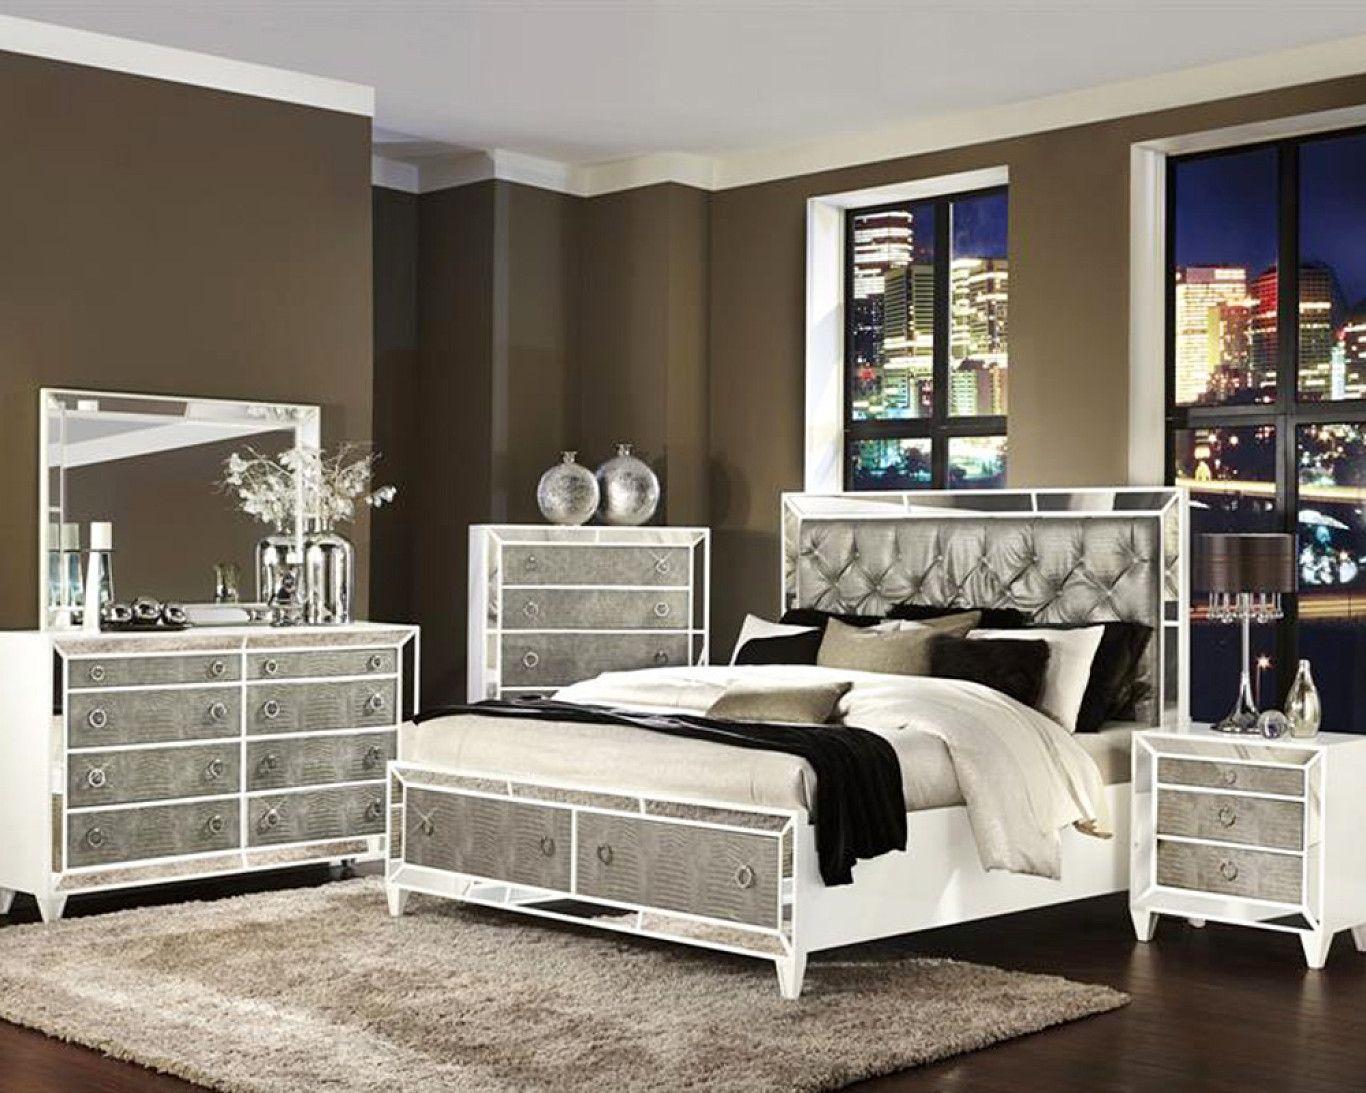 7 Pc Bedroom Set For 199 Las Vegas Full Size Bedroom Furniture Sets Glass Bedroom Set Bedroom Set Luxury Bedroom Sets